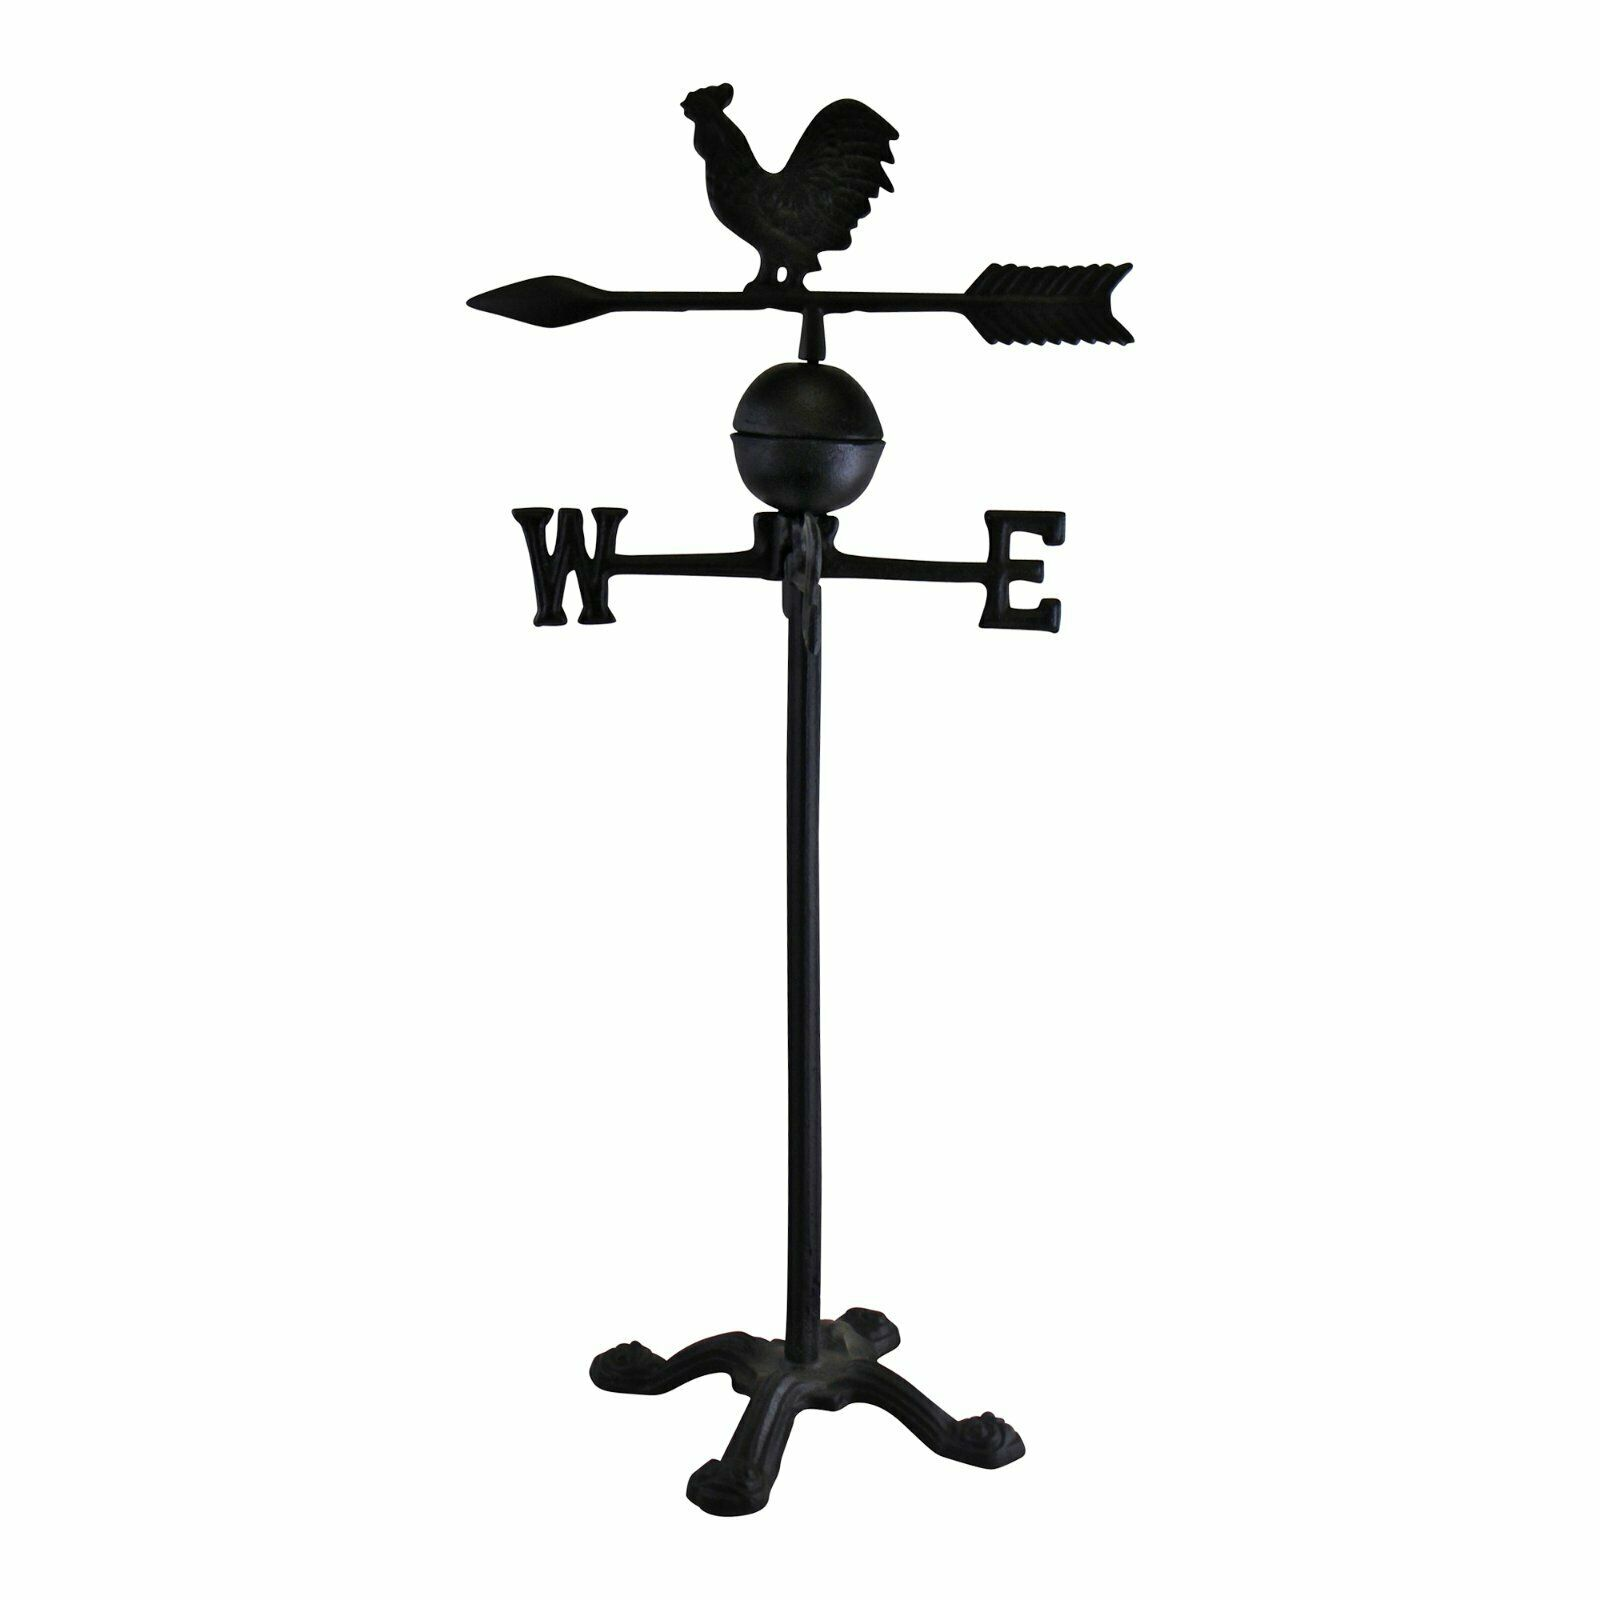 Large Cast Iron Freestanding Rooster Weather Vane Vintage Design Weathervane